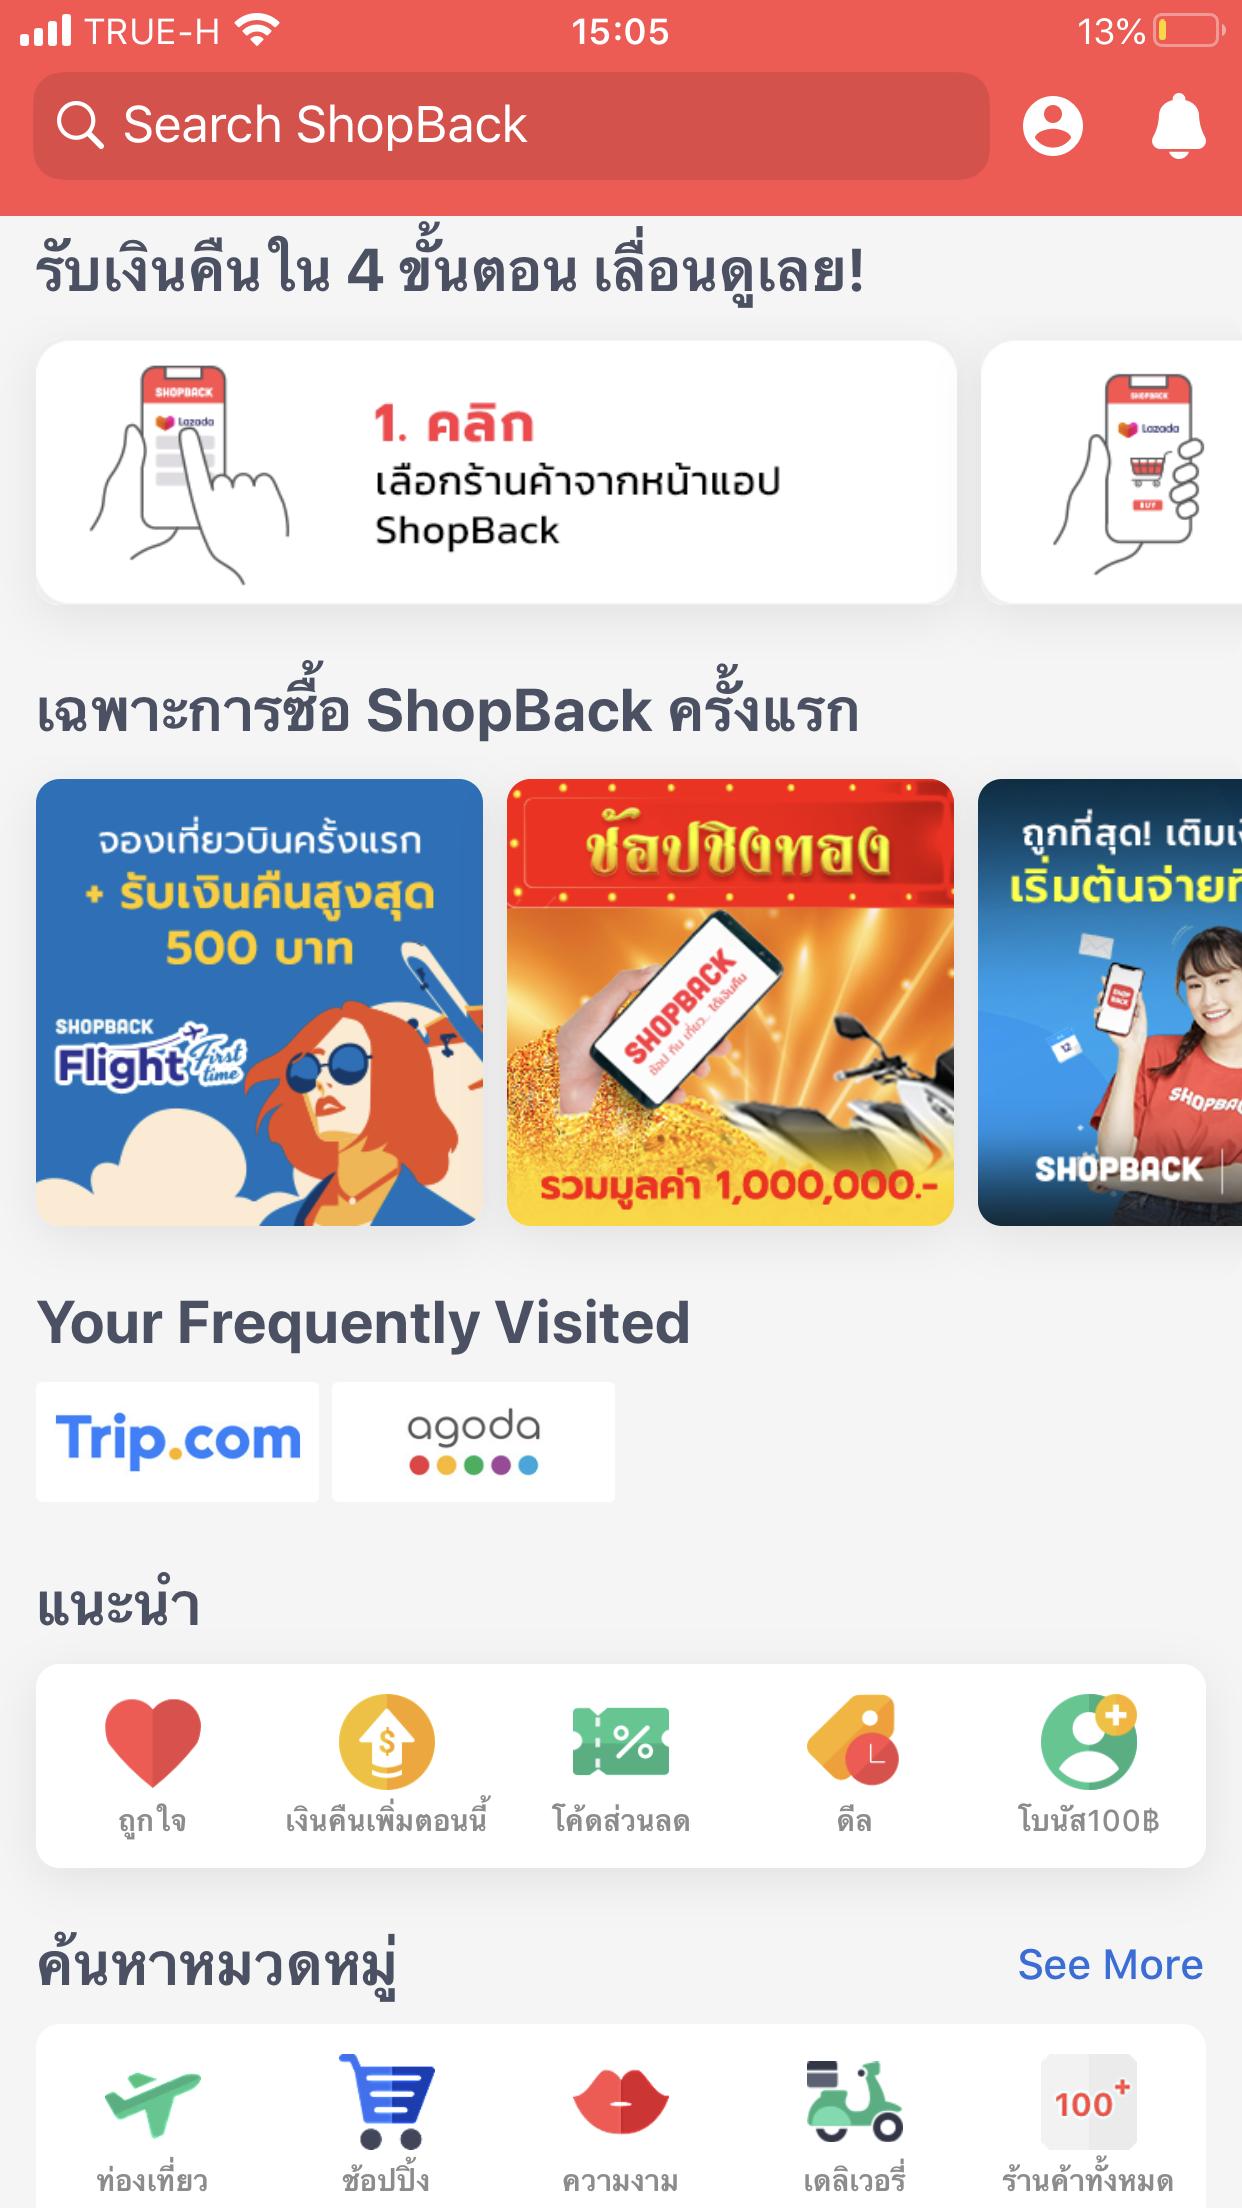 Banana IT - ShopBack